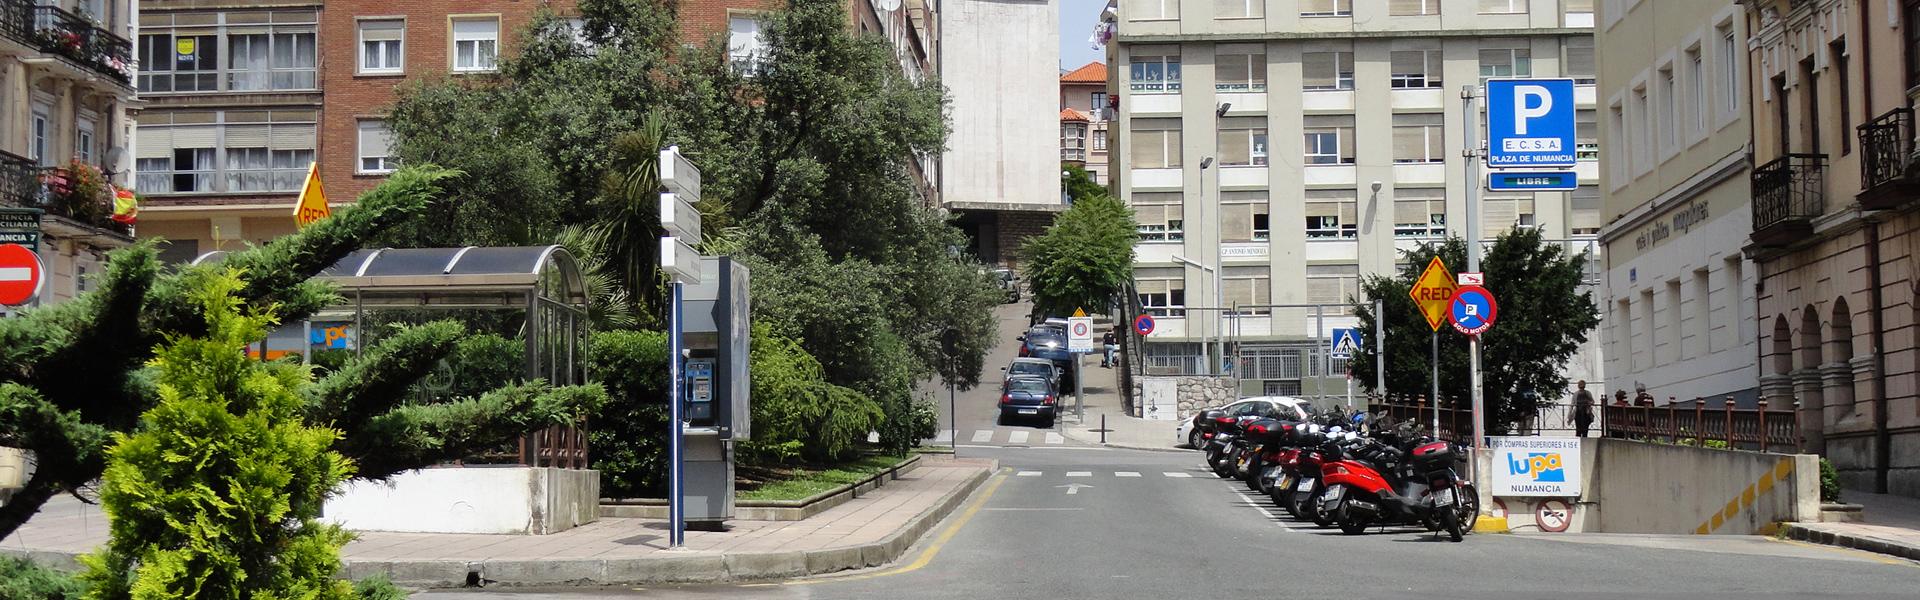 Parking Plaza Numancia, Santander